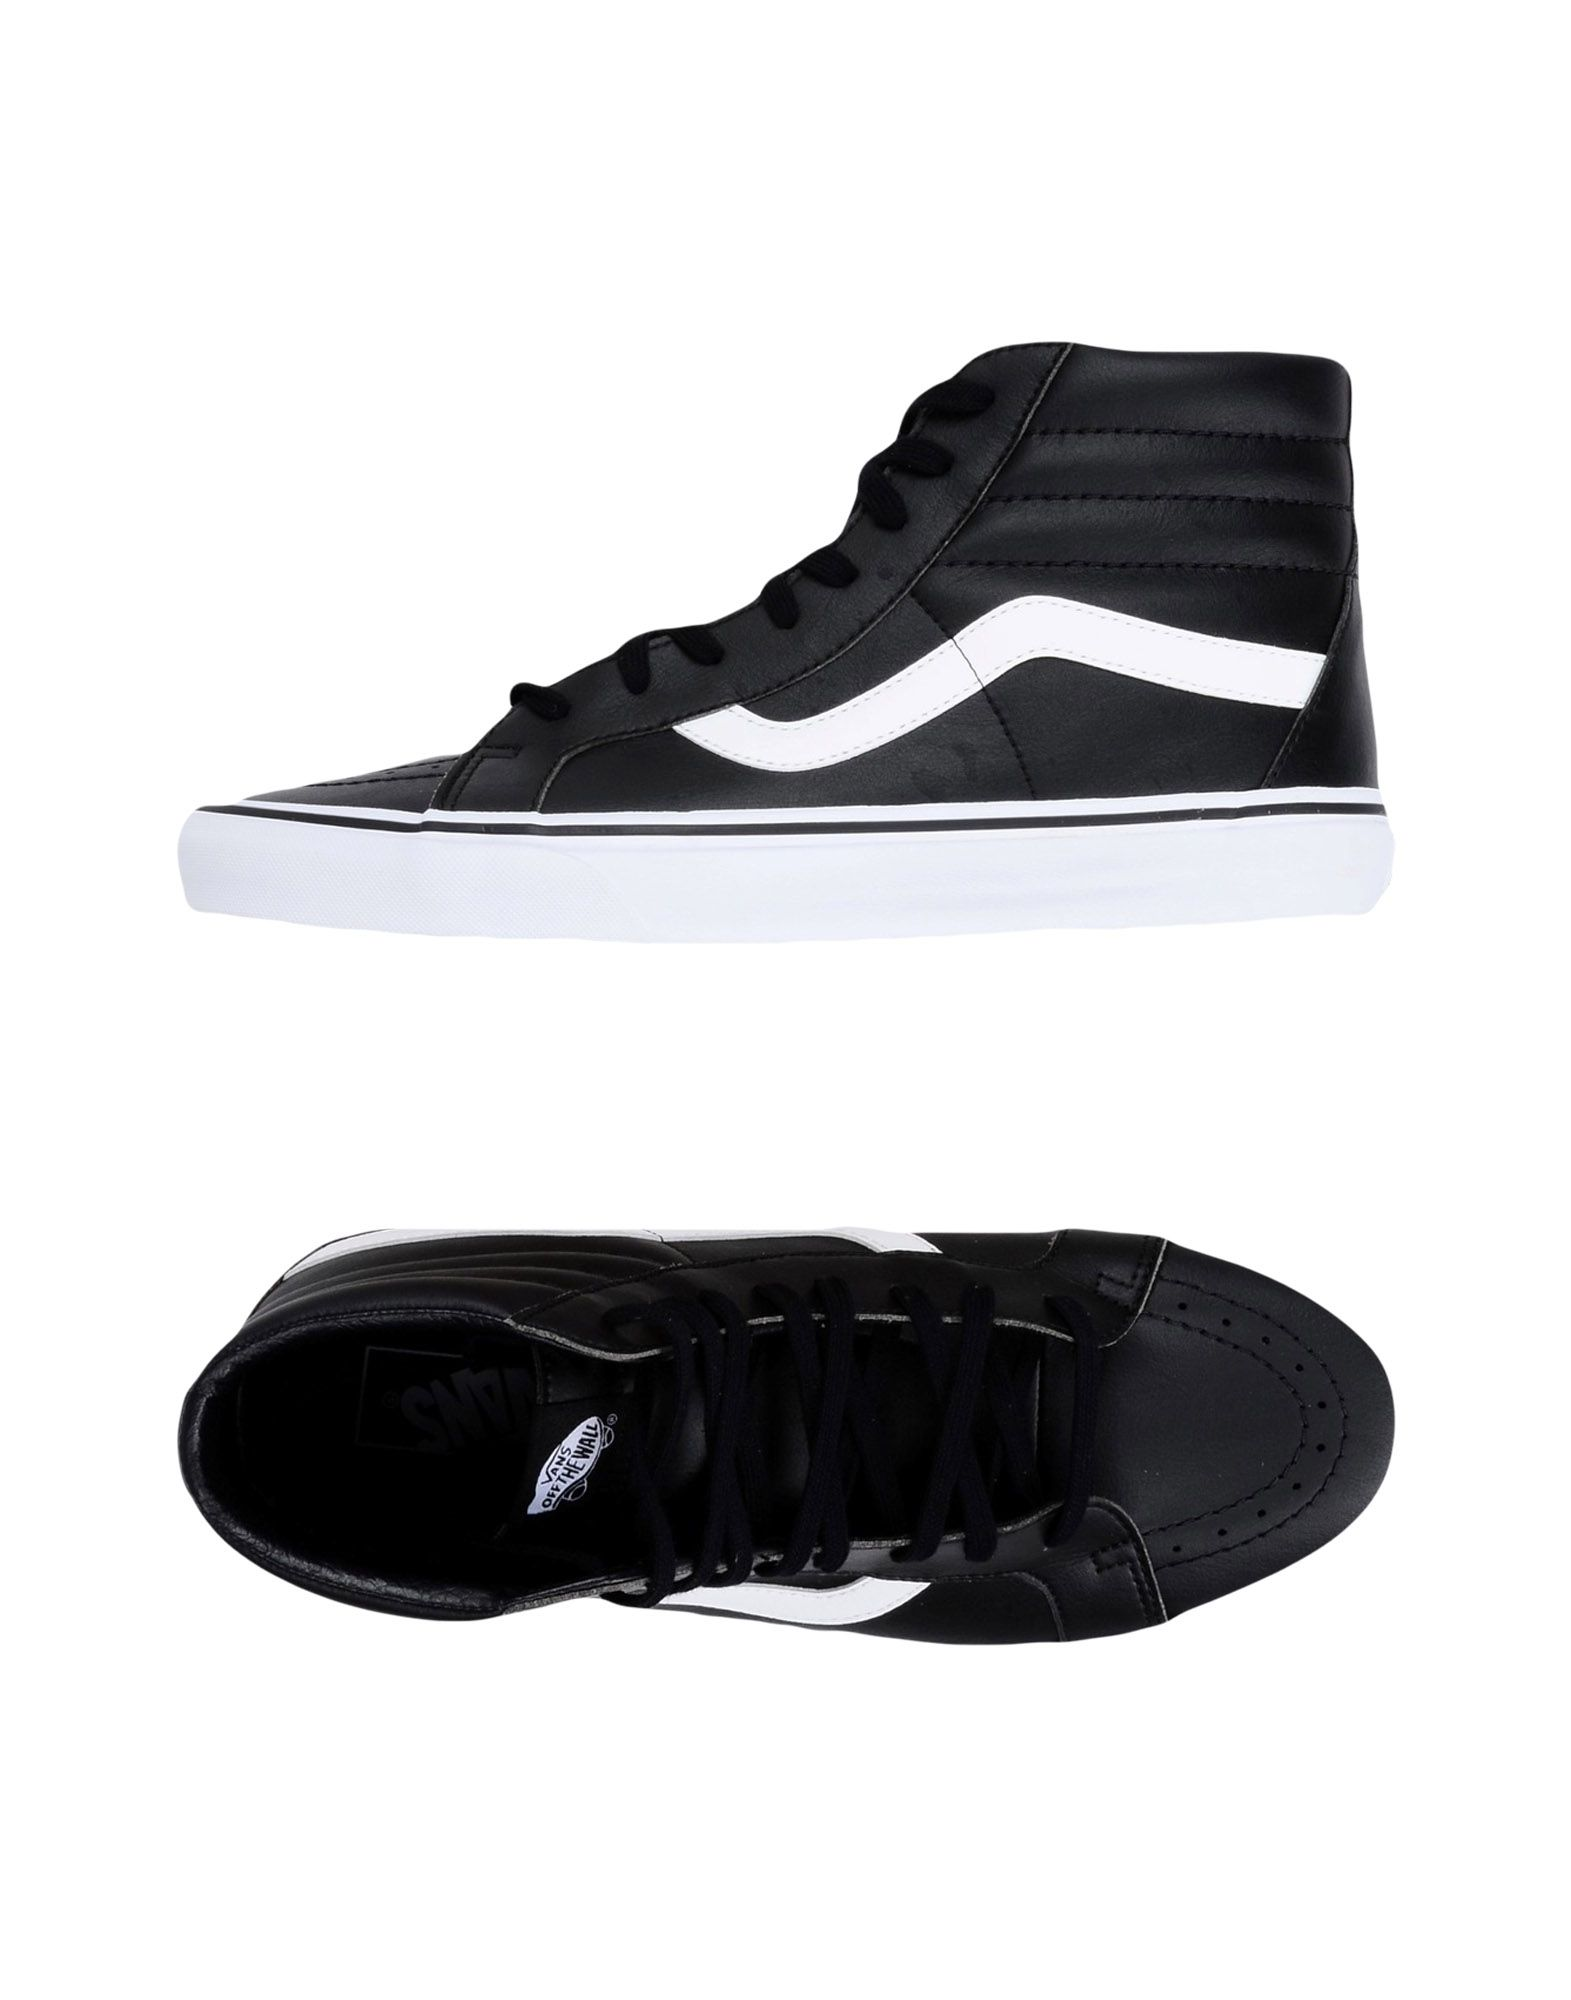 VANS Высокие кеды и кроссовки кеды кроссовки высокие женские dc evan txse blue brown white